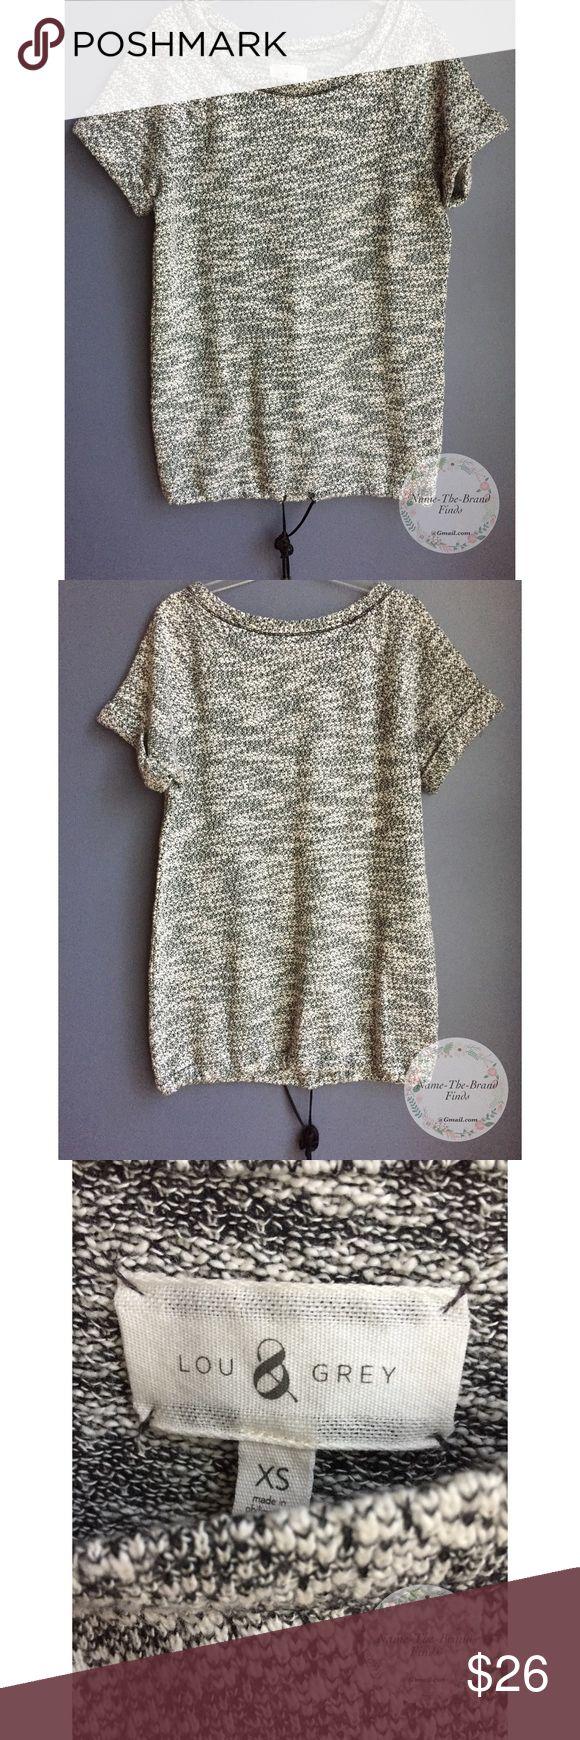 Lou & Grey Space grey Short Sleeve Top Lou & Grey Space grey Short Sleeve Top, size XS, Pull-string detail Lou & Grey Tops Blouses